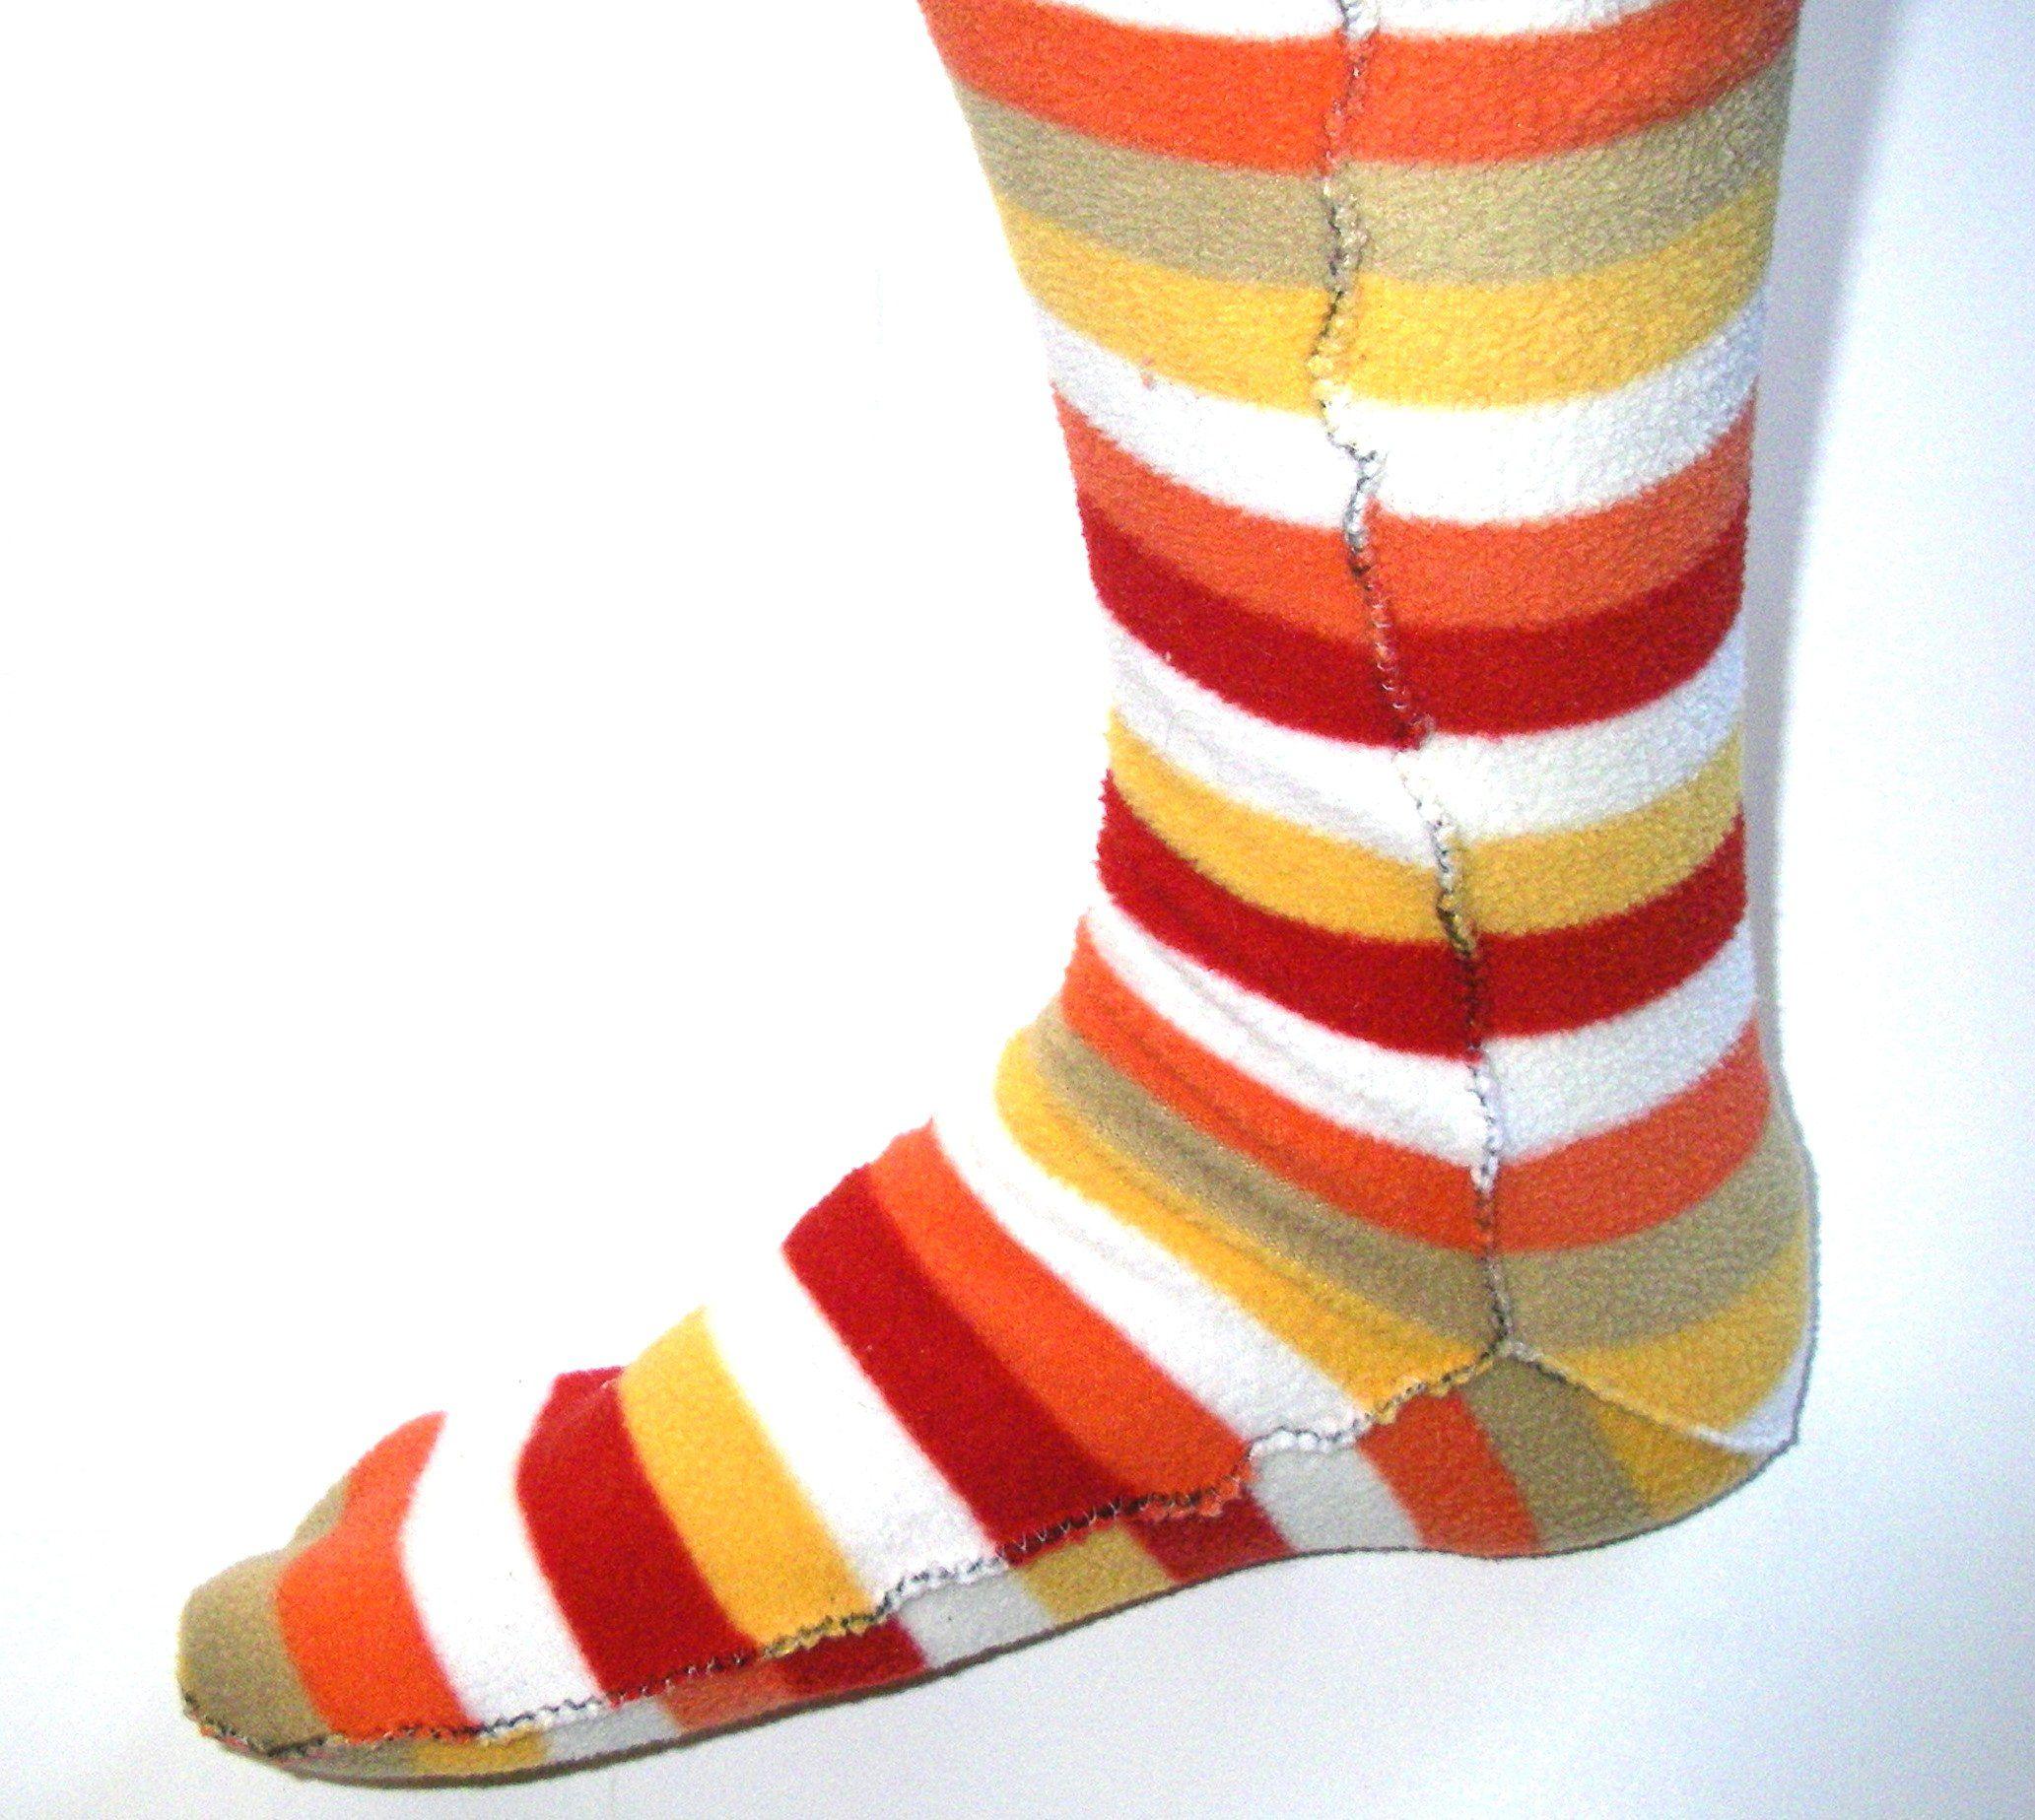 Cozy socks from polarfleece blanket diy socks sewing